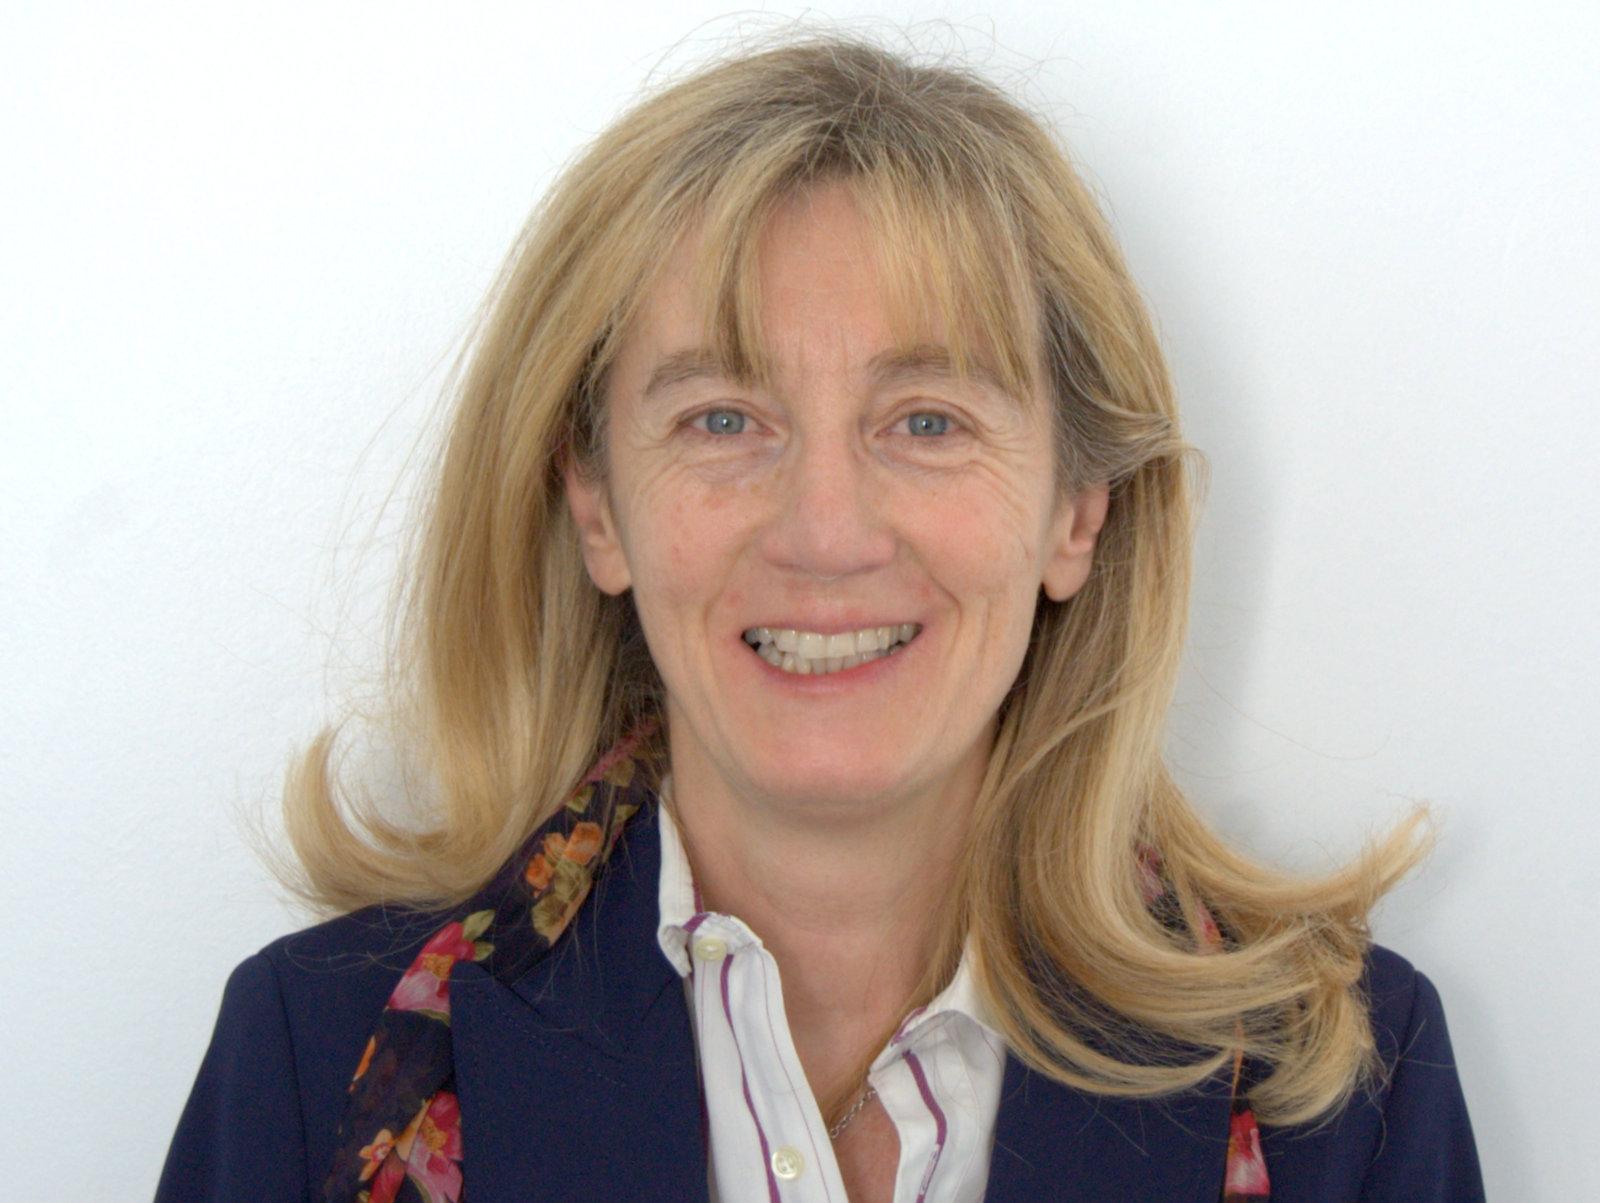 Dott.ssa Camilla Nosari